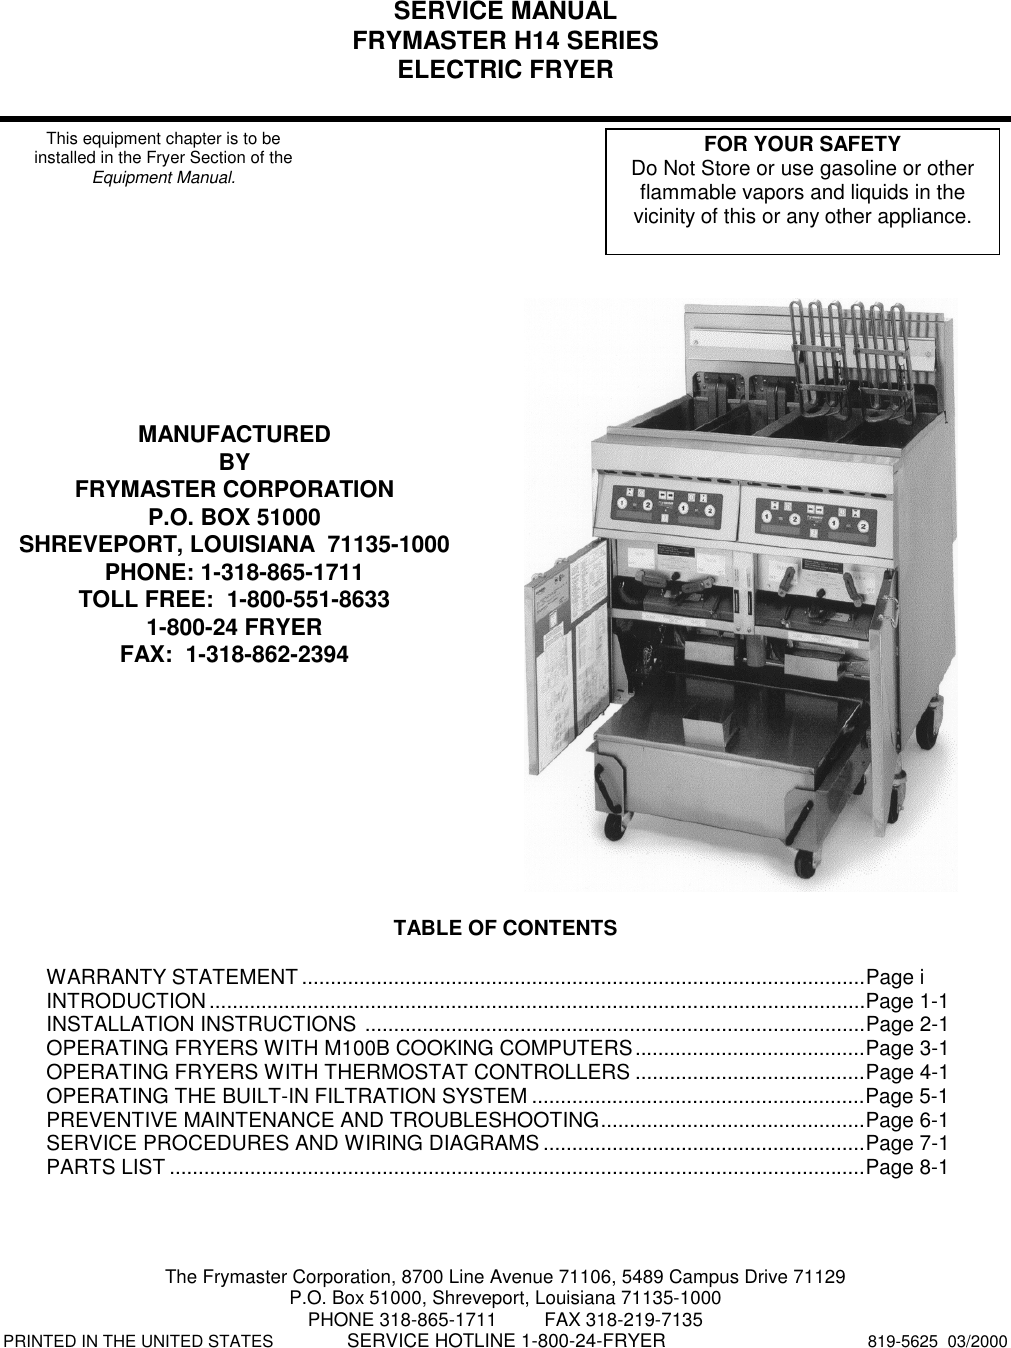 frymaster h14 series users manual operator s